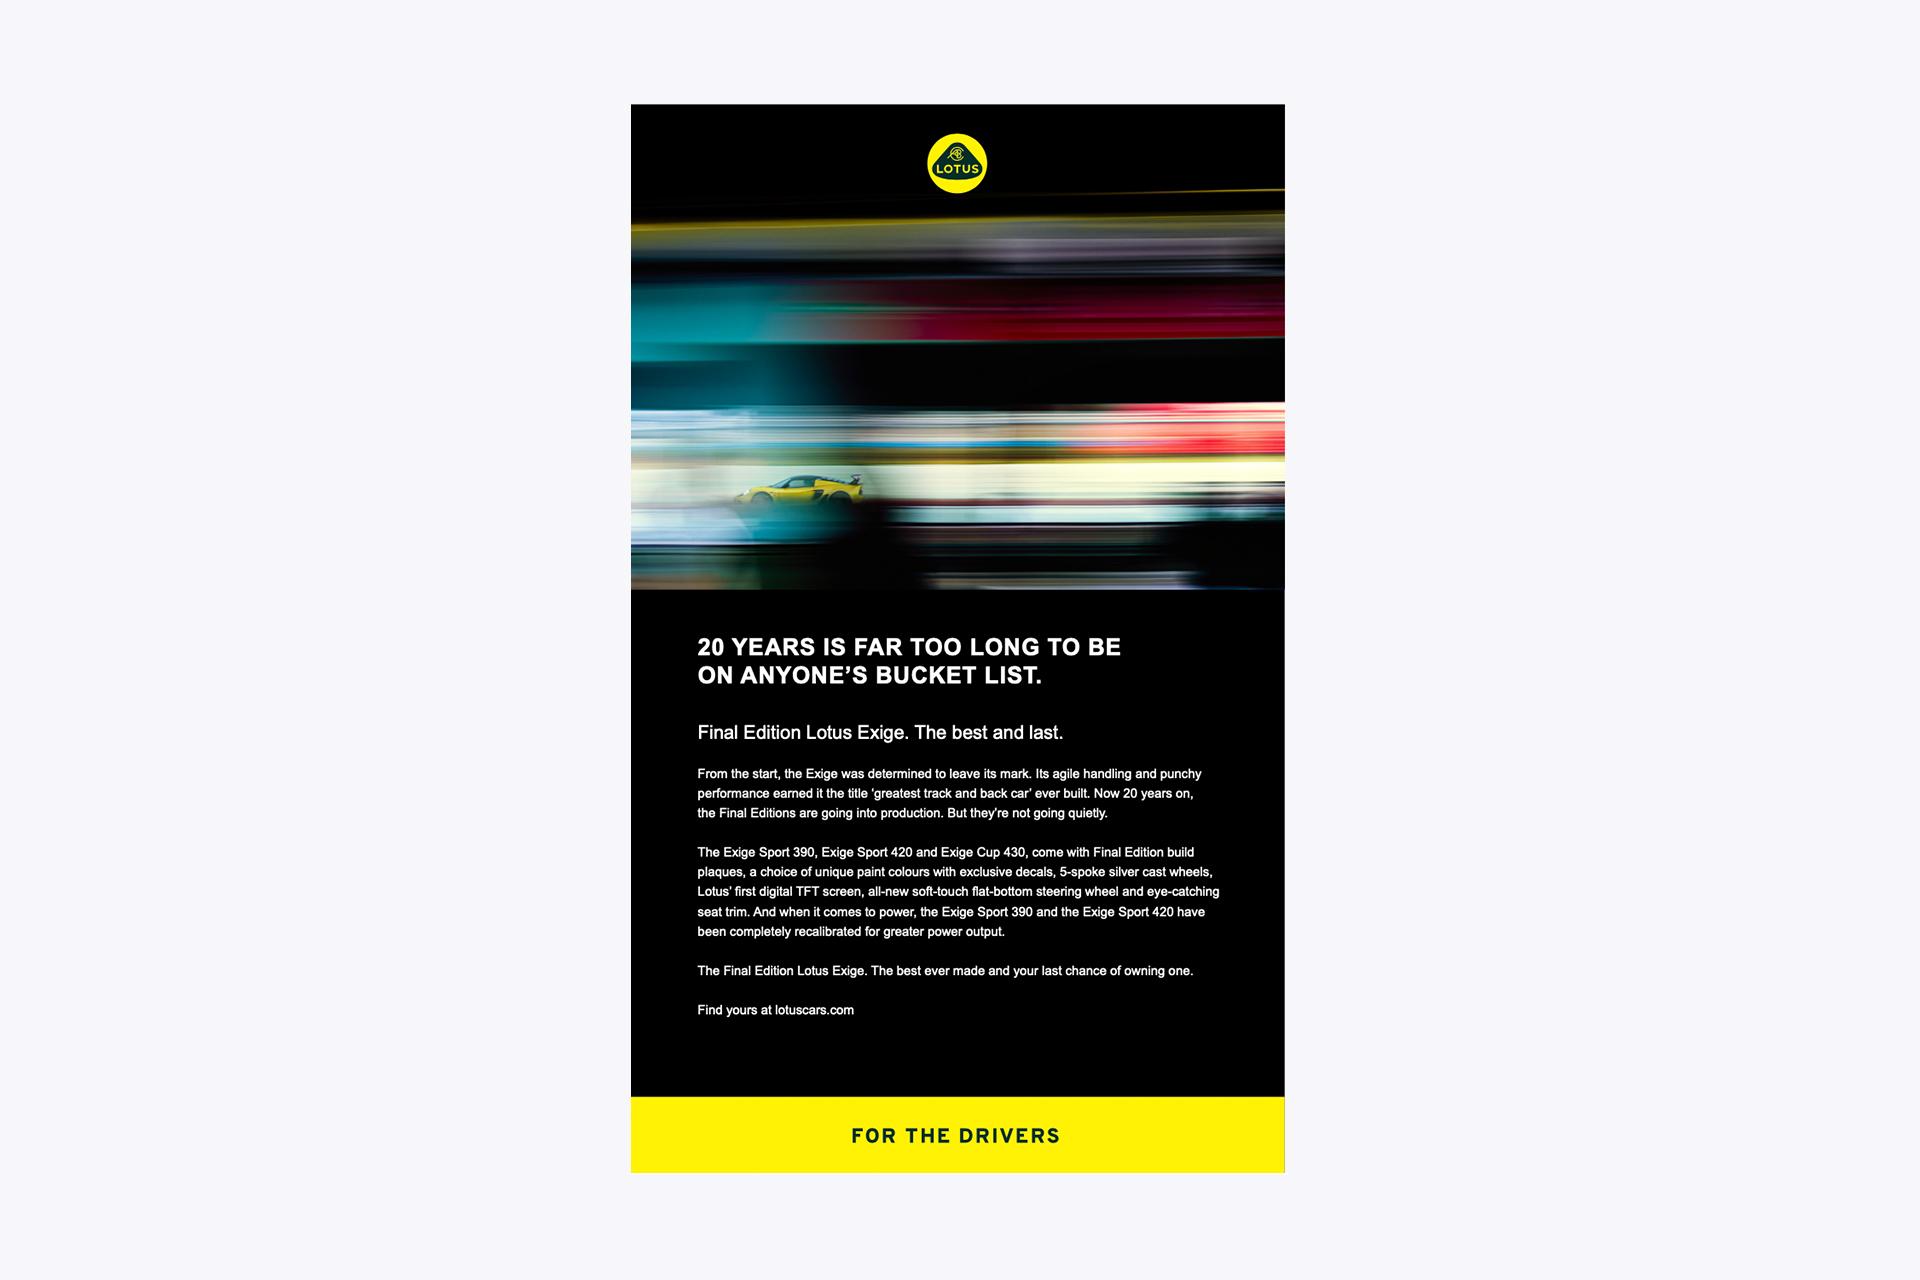 Lotus_Elise&Exige_bucketlist_Cover_image_temp copy